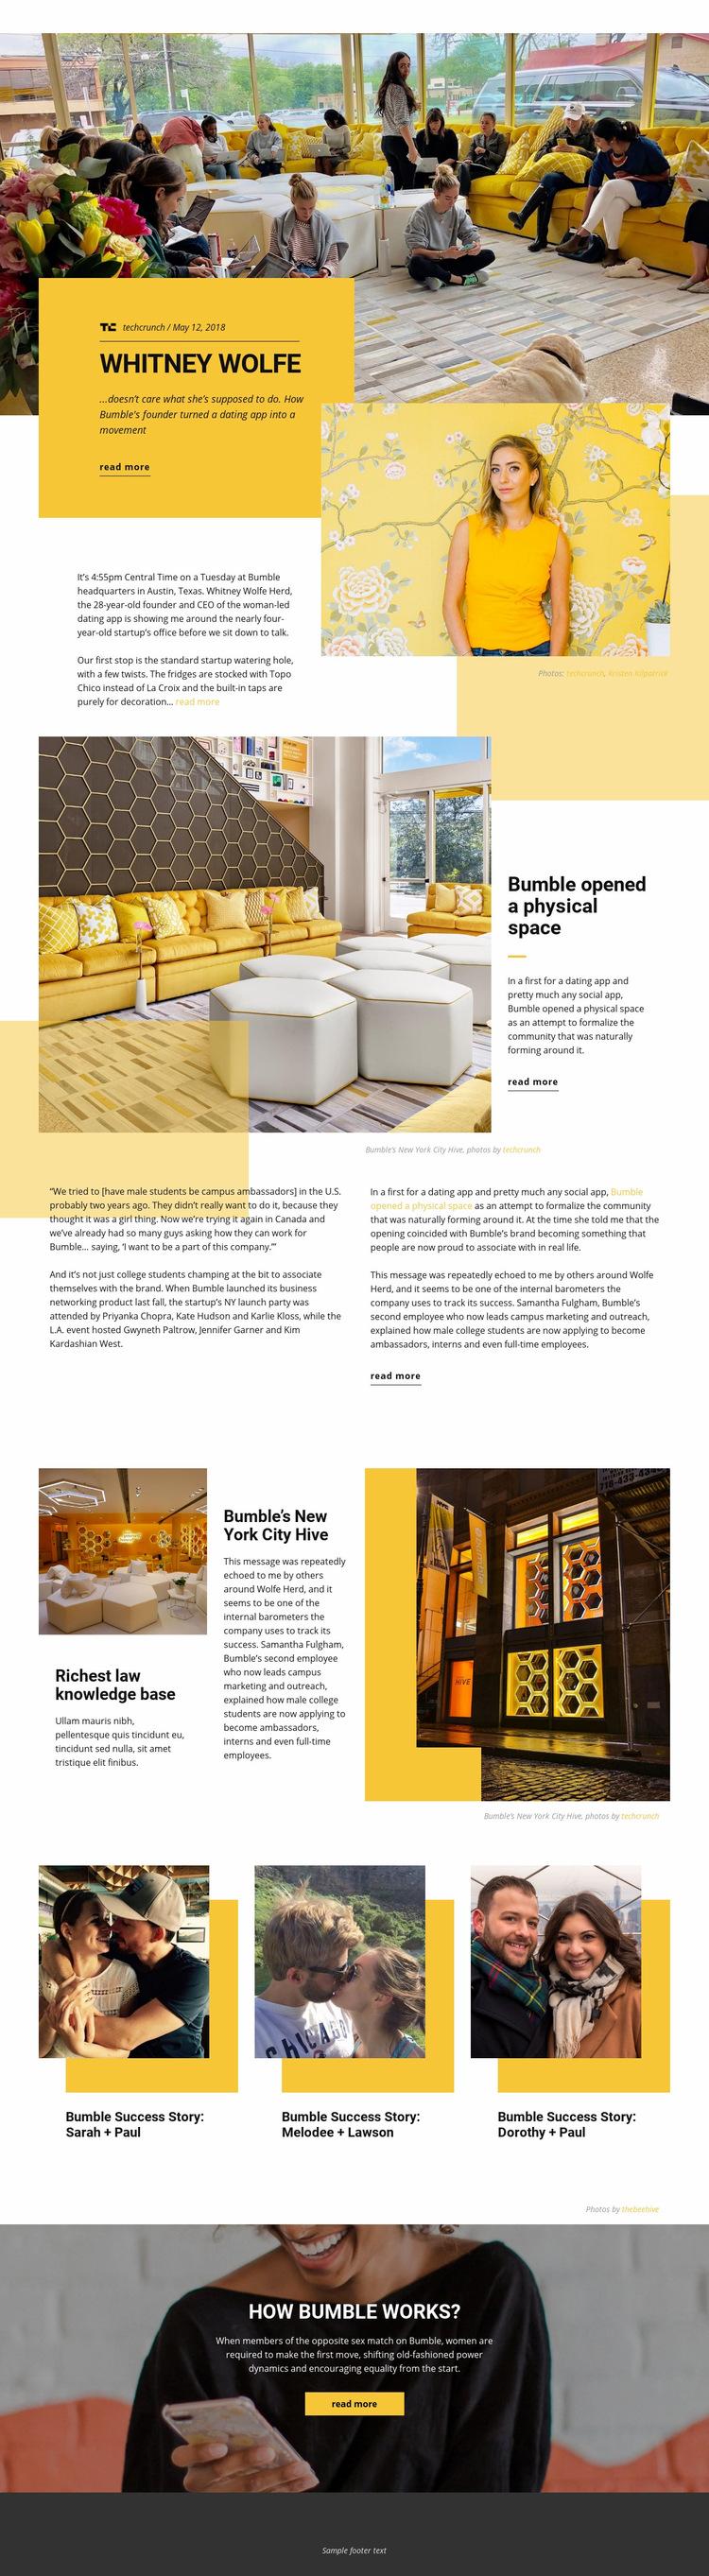 Bumble Space Web Page Design